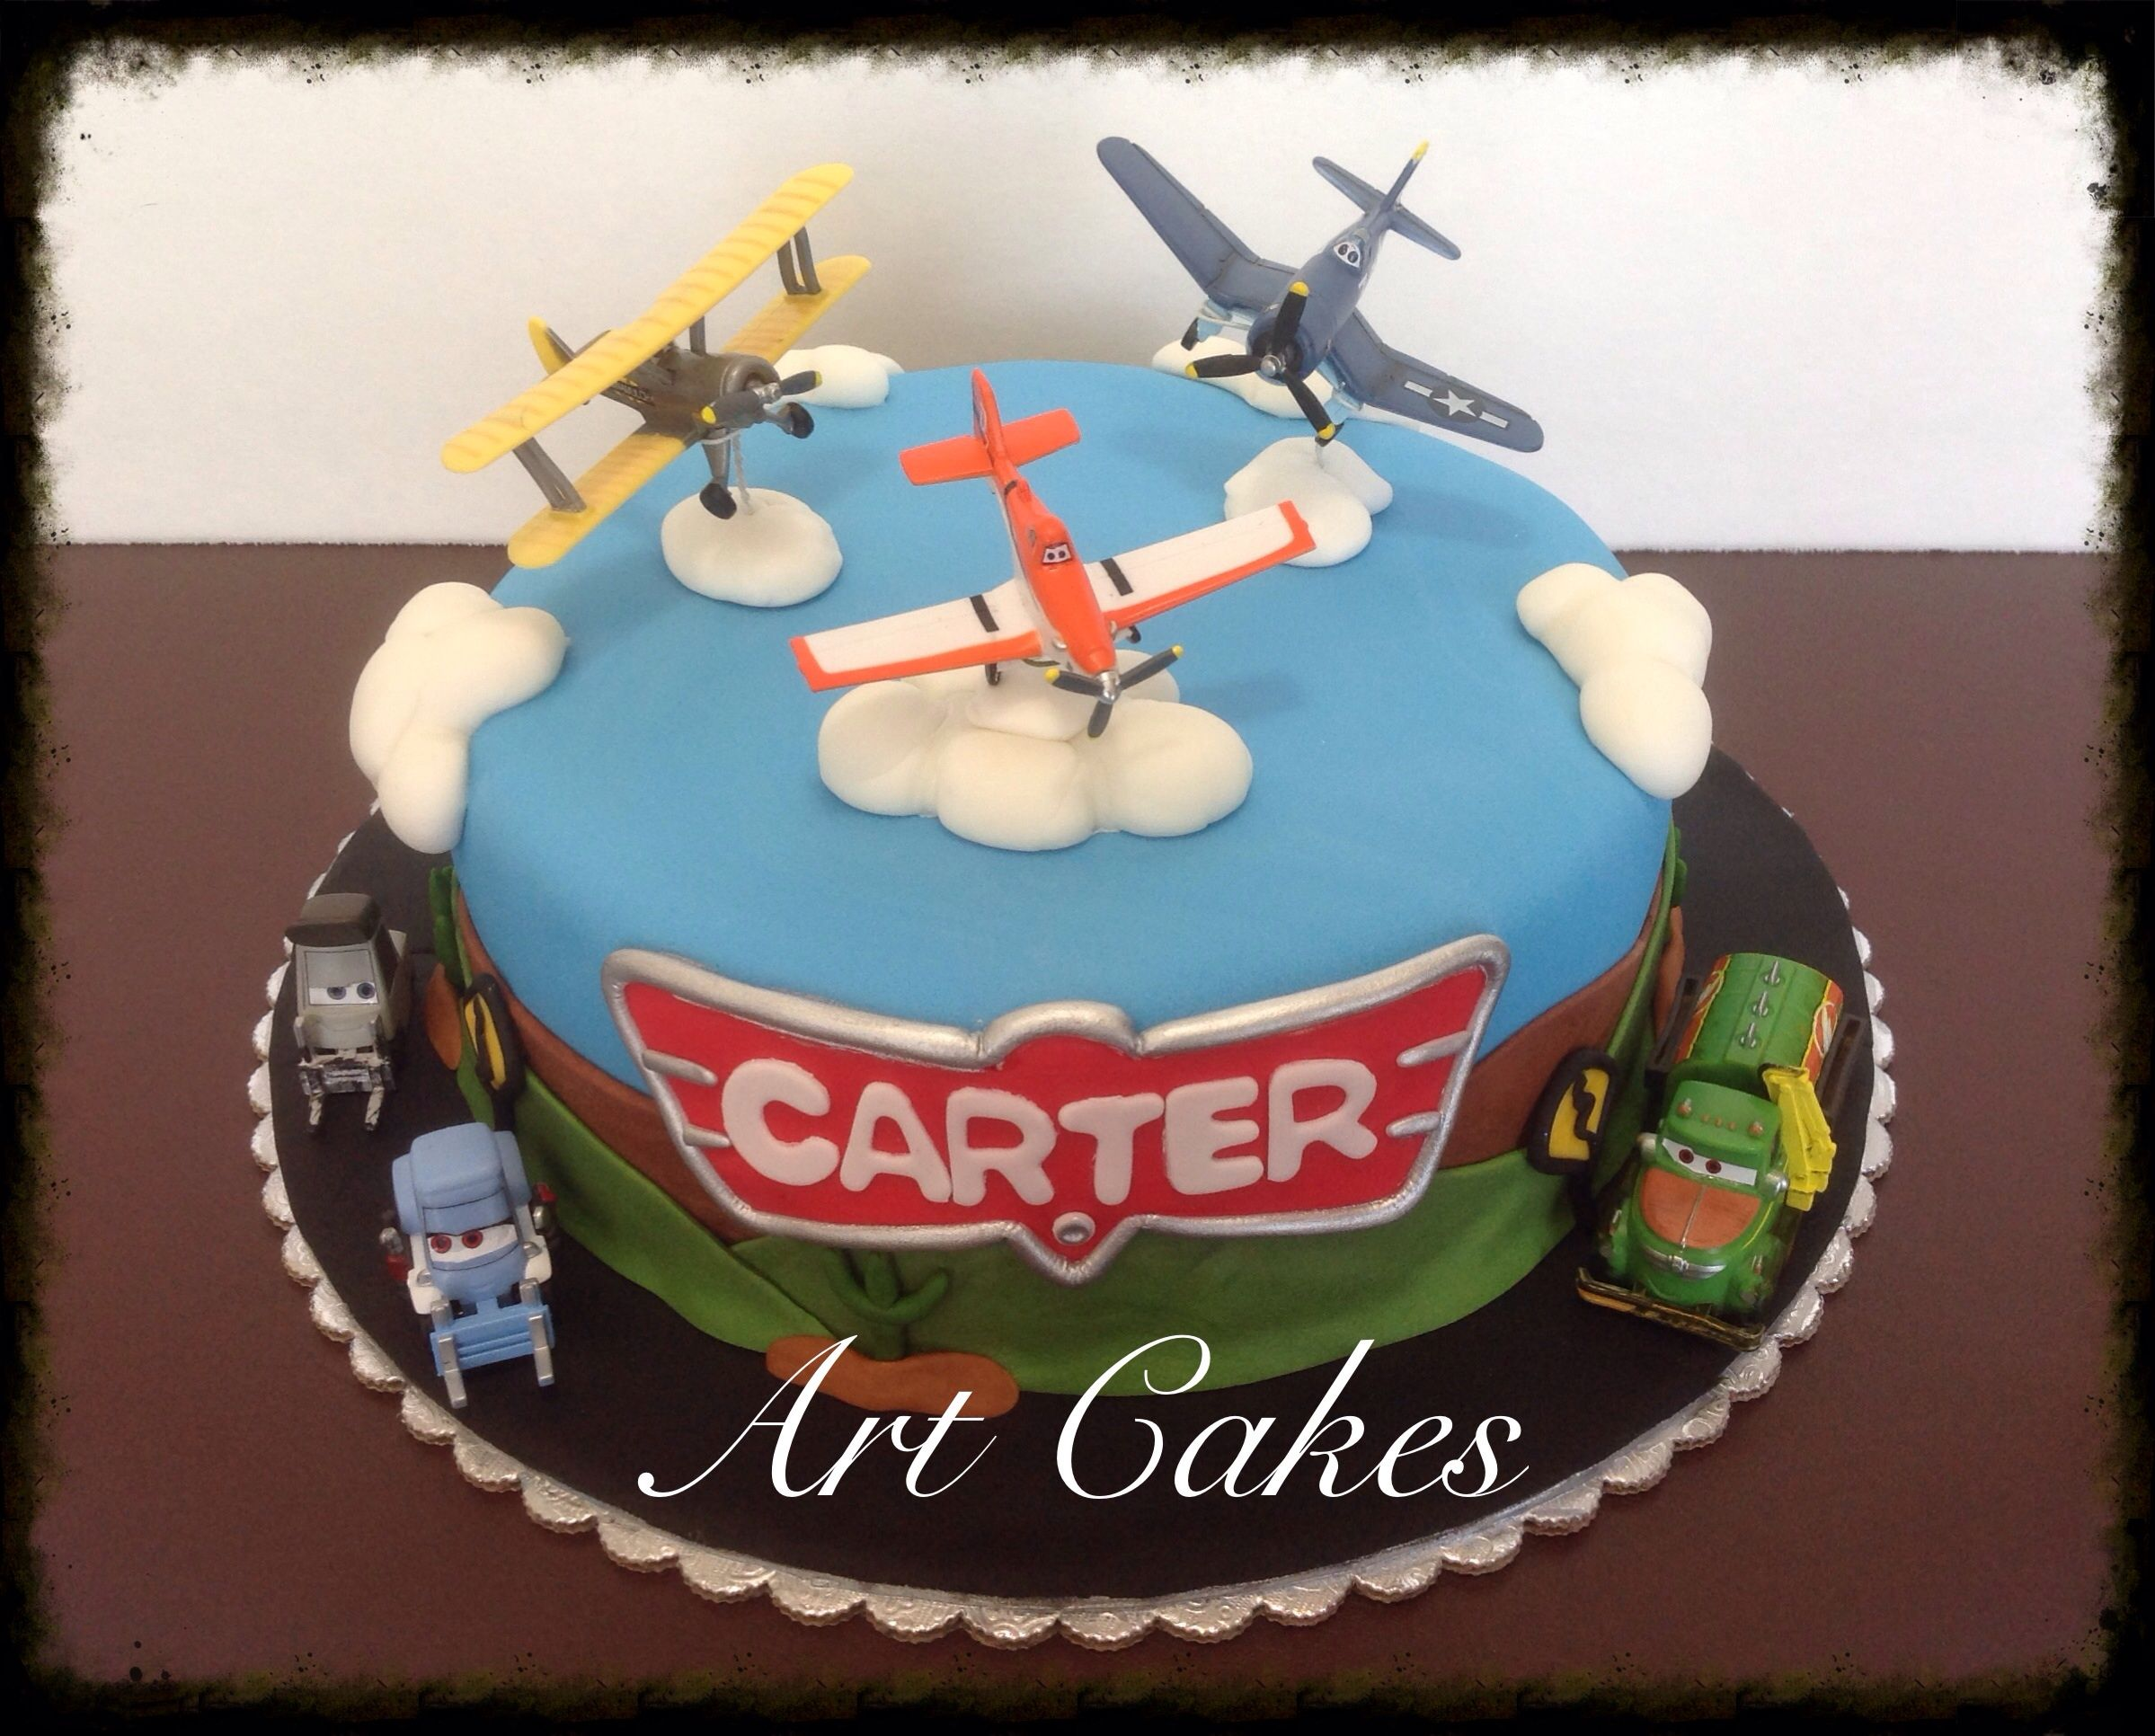 Disney Planes Cake Images : Disney Planes Cake Cakes Pinterest